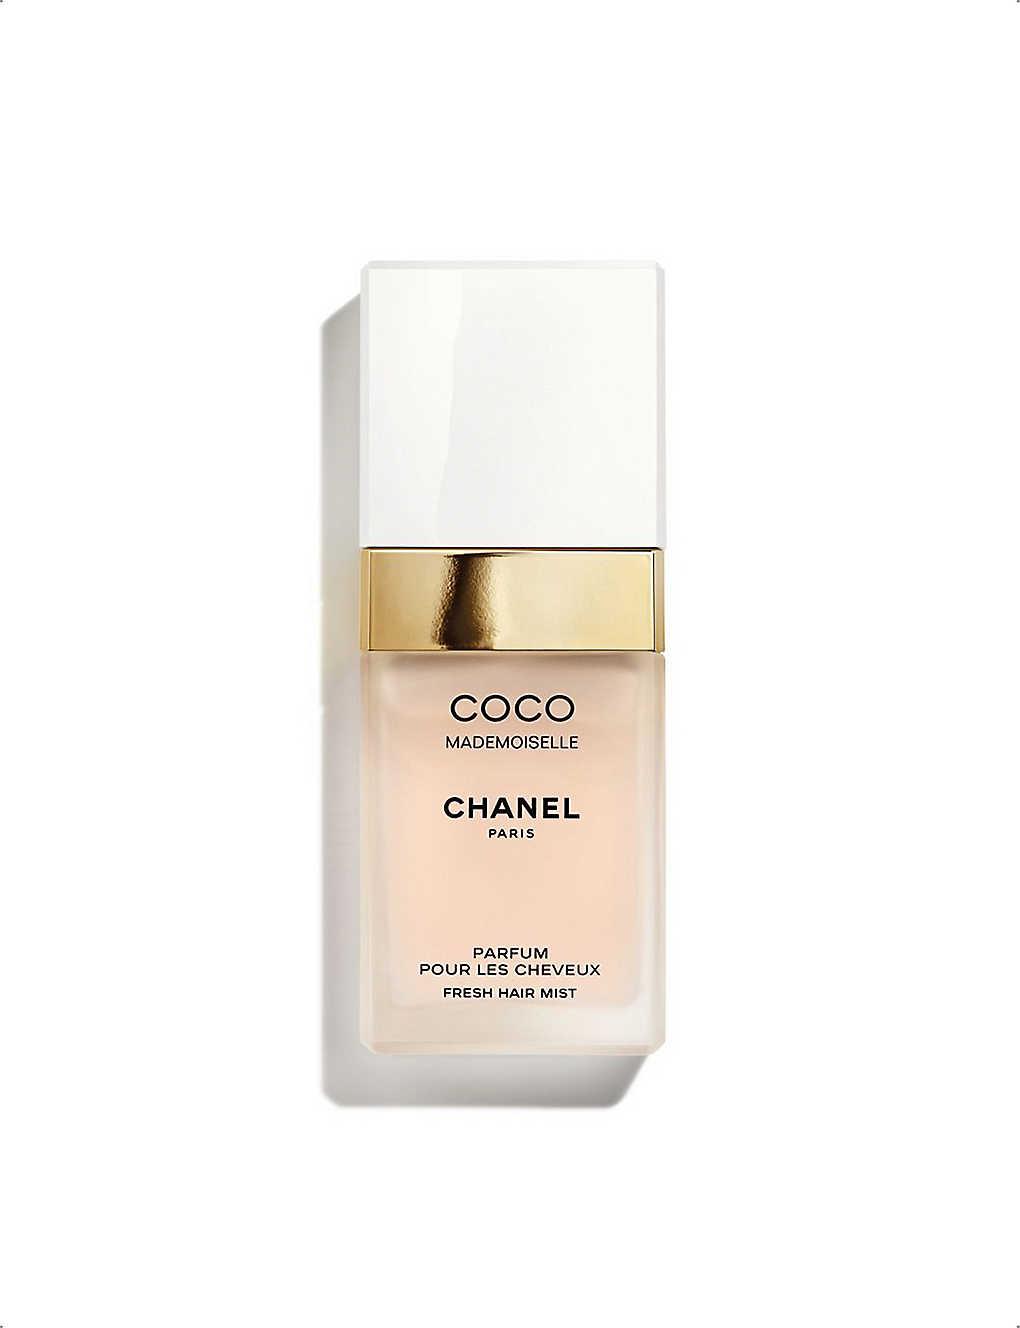 333dd2db3 CHANEL - COCO MADEMOISELLE Fresh Hair Mist | Selfridges.com